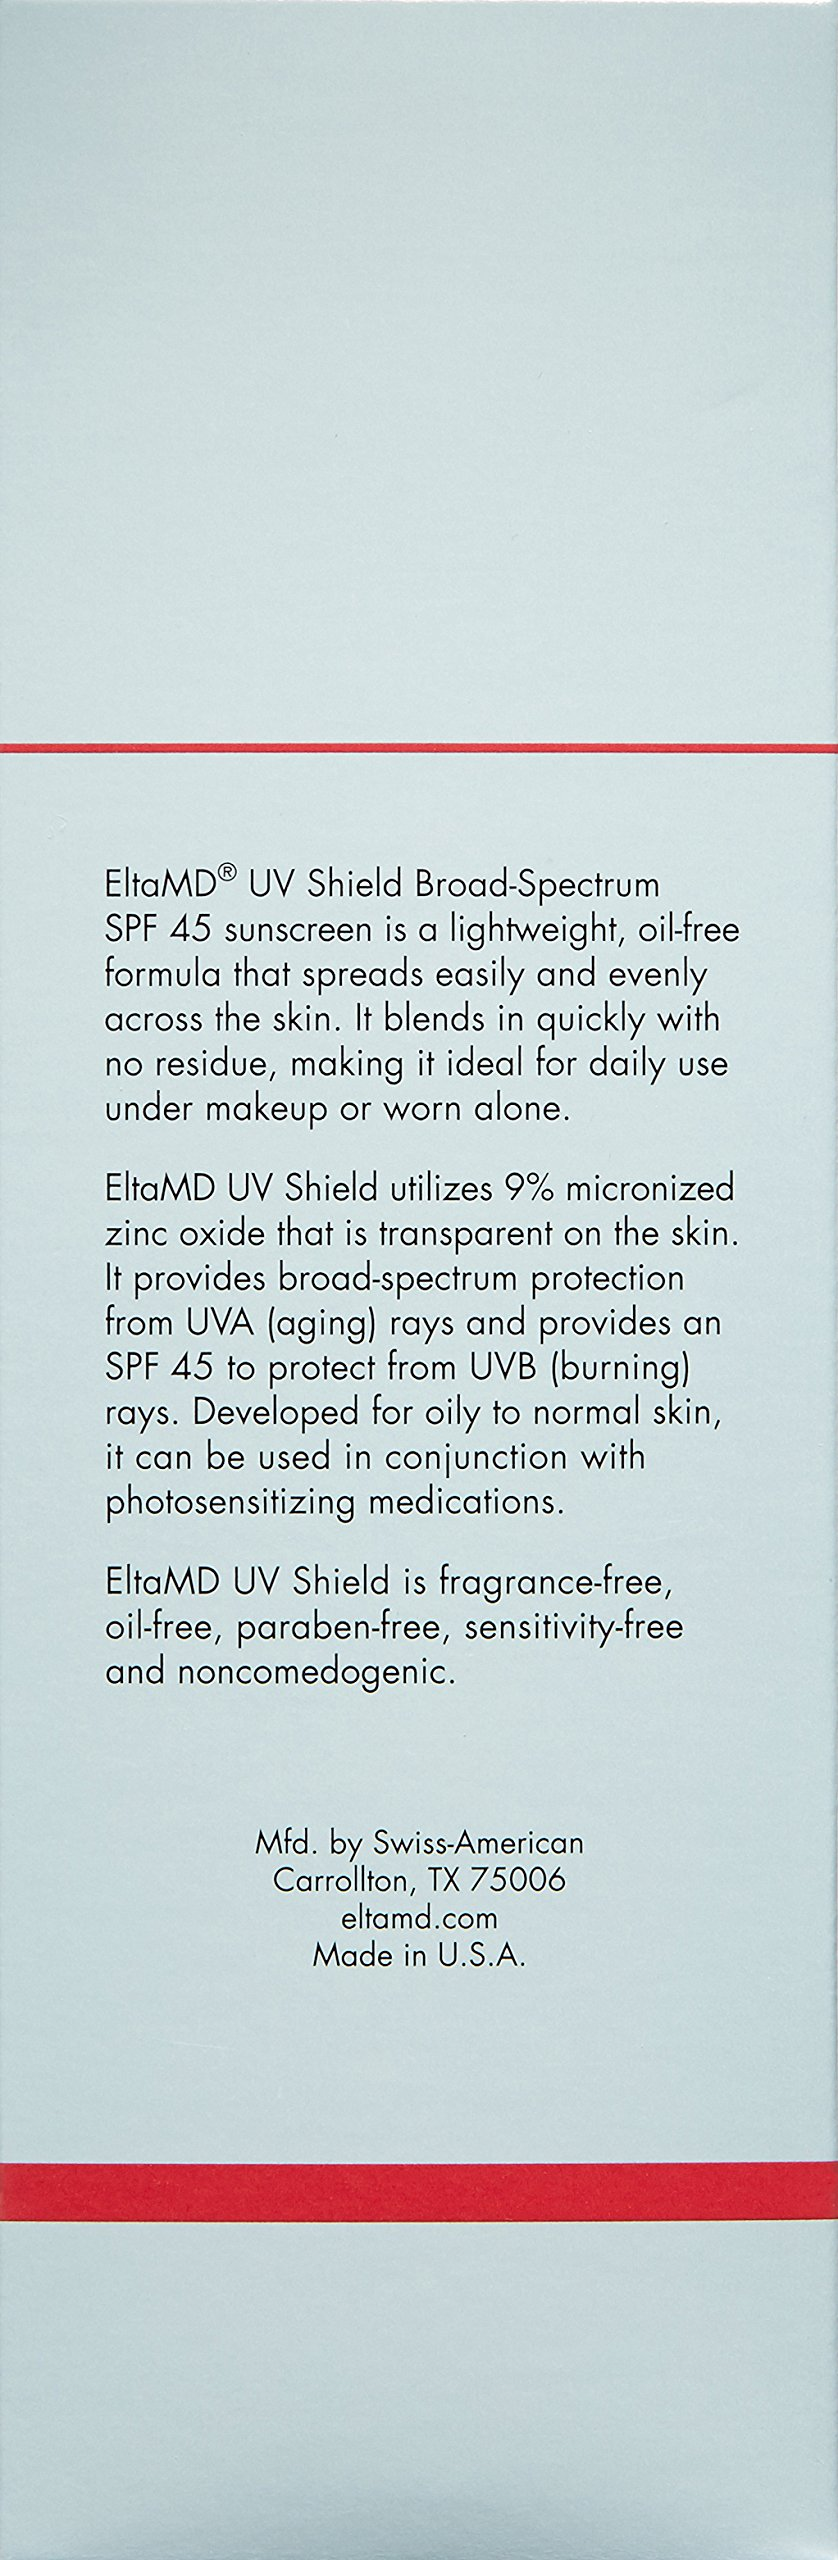 EltaMD UV Lotion Sunscreen Broad-Spectrum SPF 30+, 7 oz by ELTA MD (Image #4)